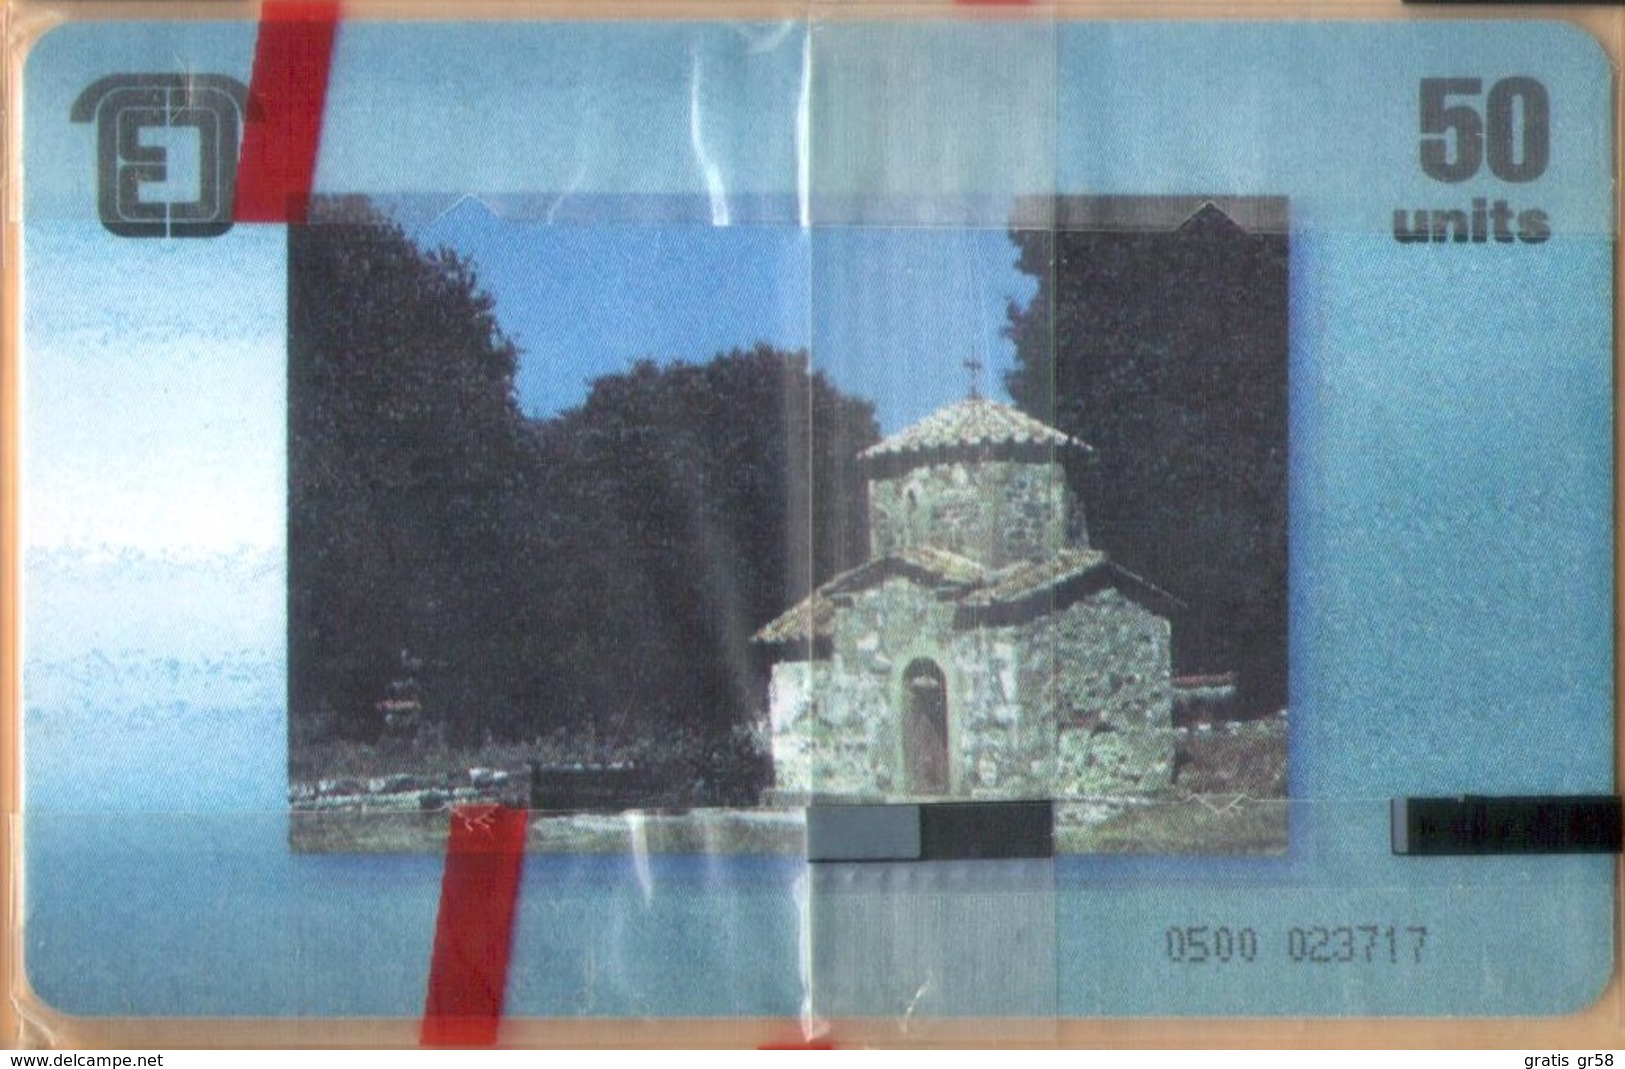 Georgia - PEL-0001, Pelikom, 1st Issued, Church, Chapels, Churches, 50 Units, 10/96, 50.000ex, Mint NSB - Géorgie